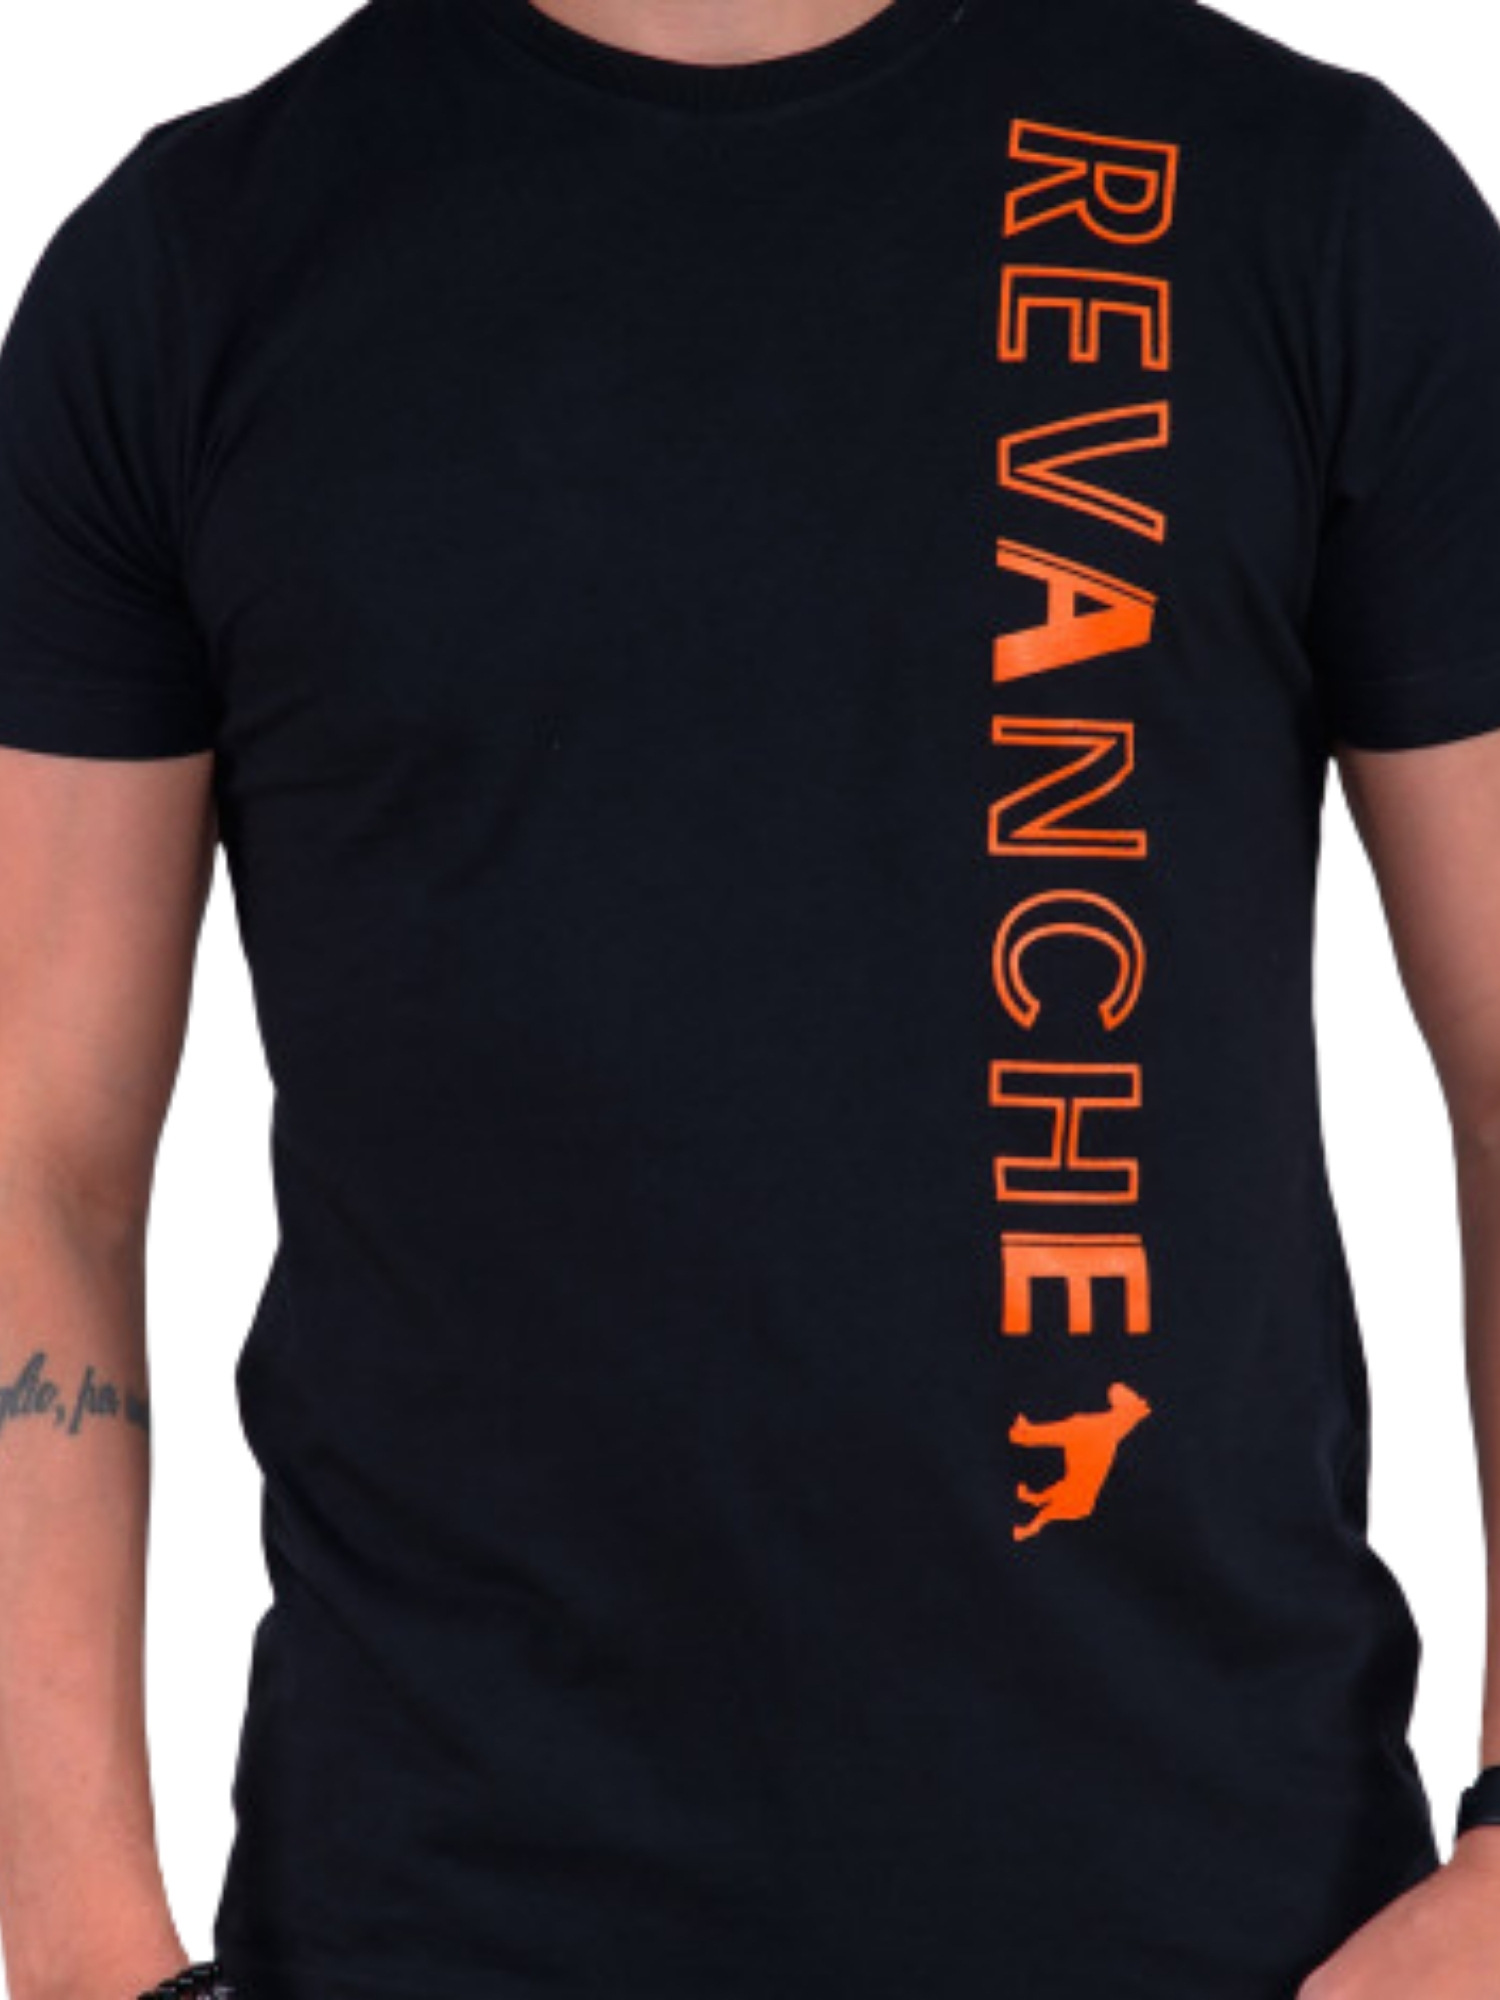 Camiseta Masculina Revanche  113438